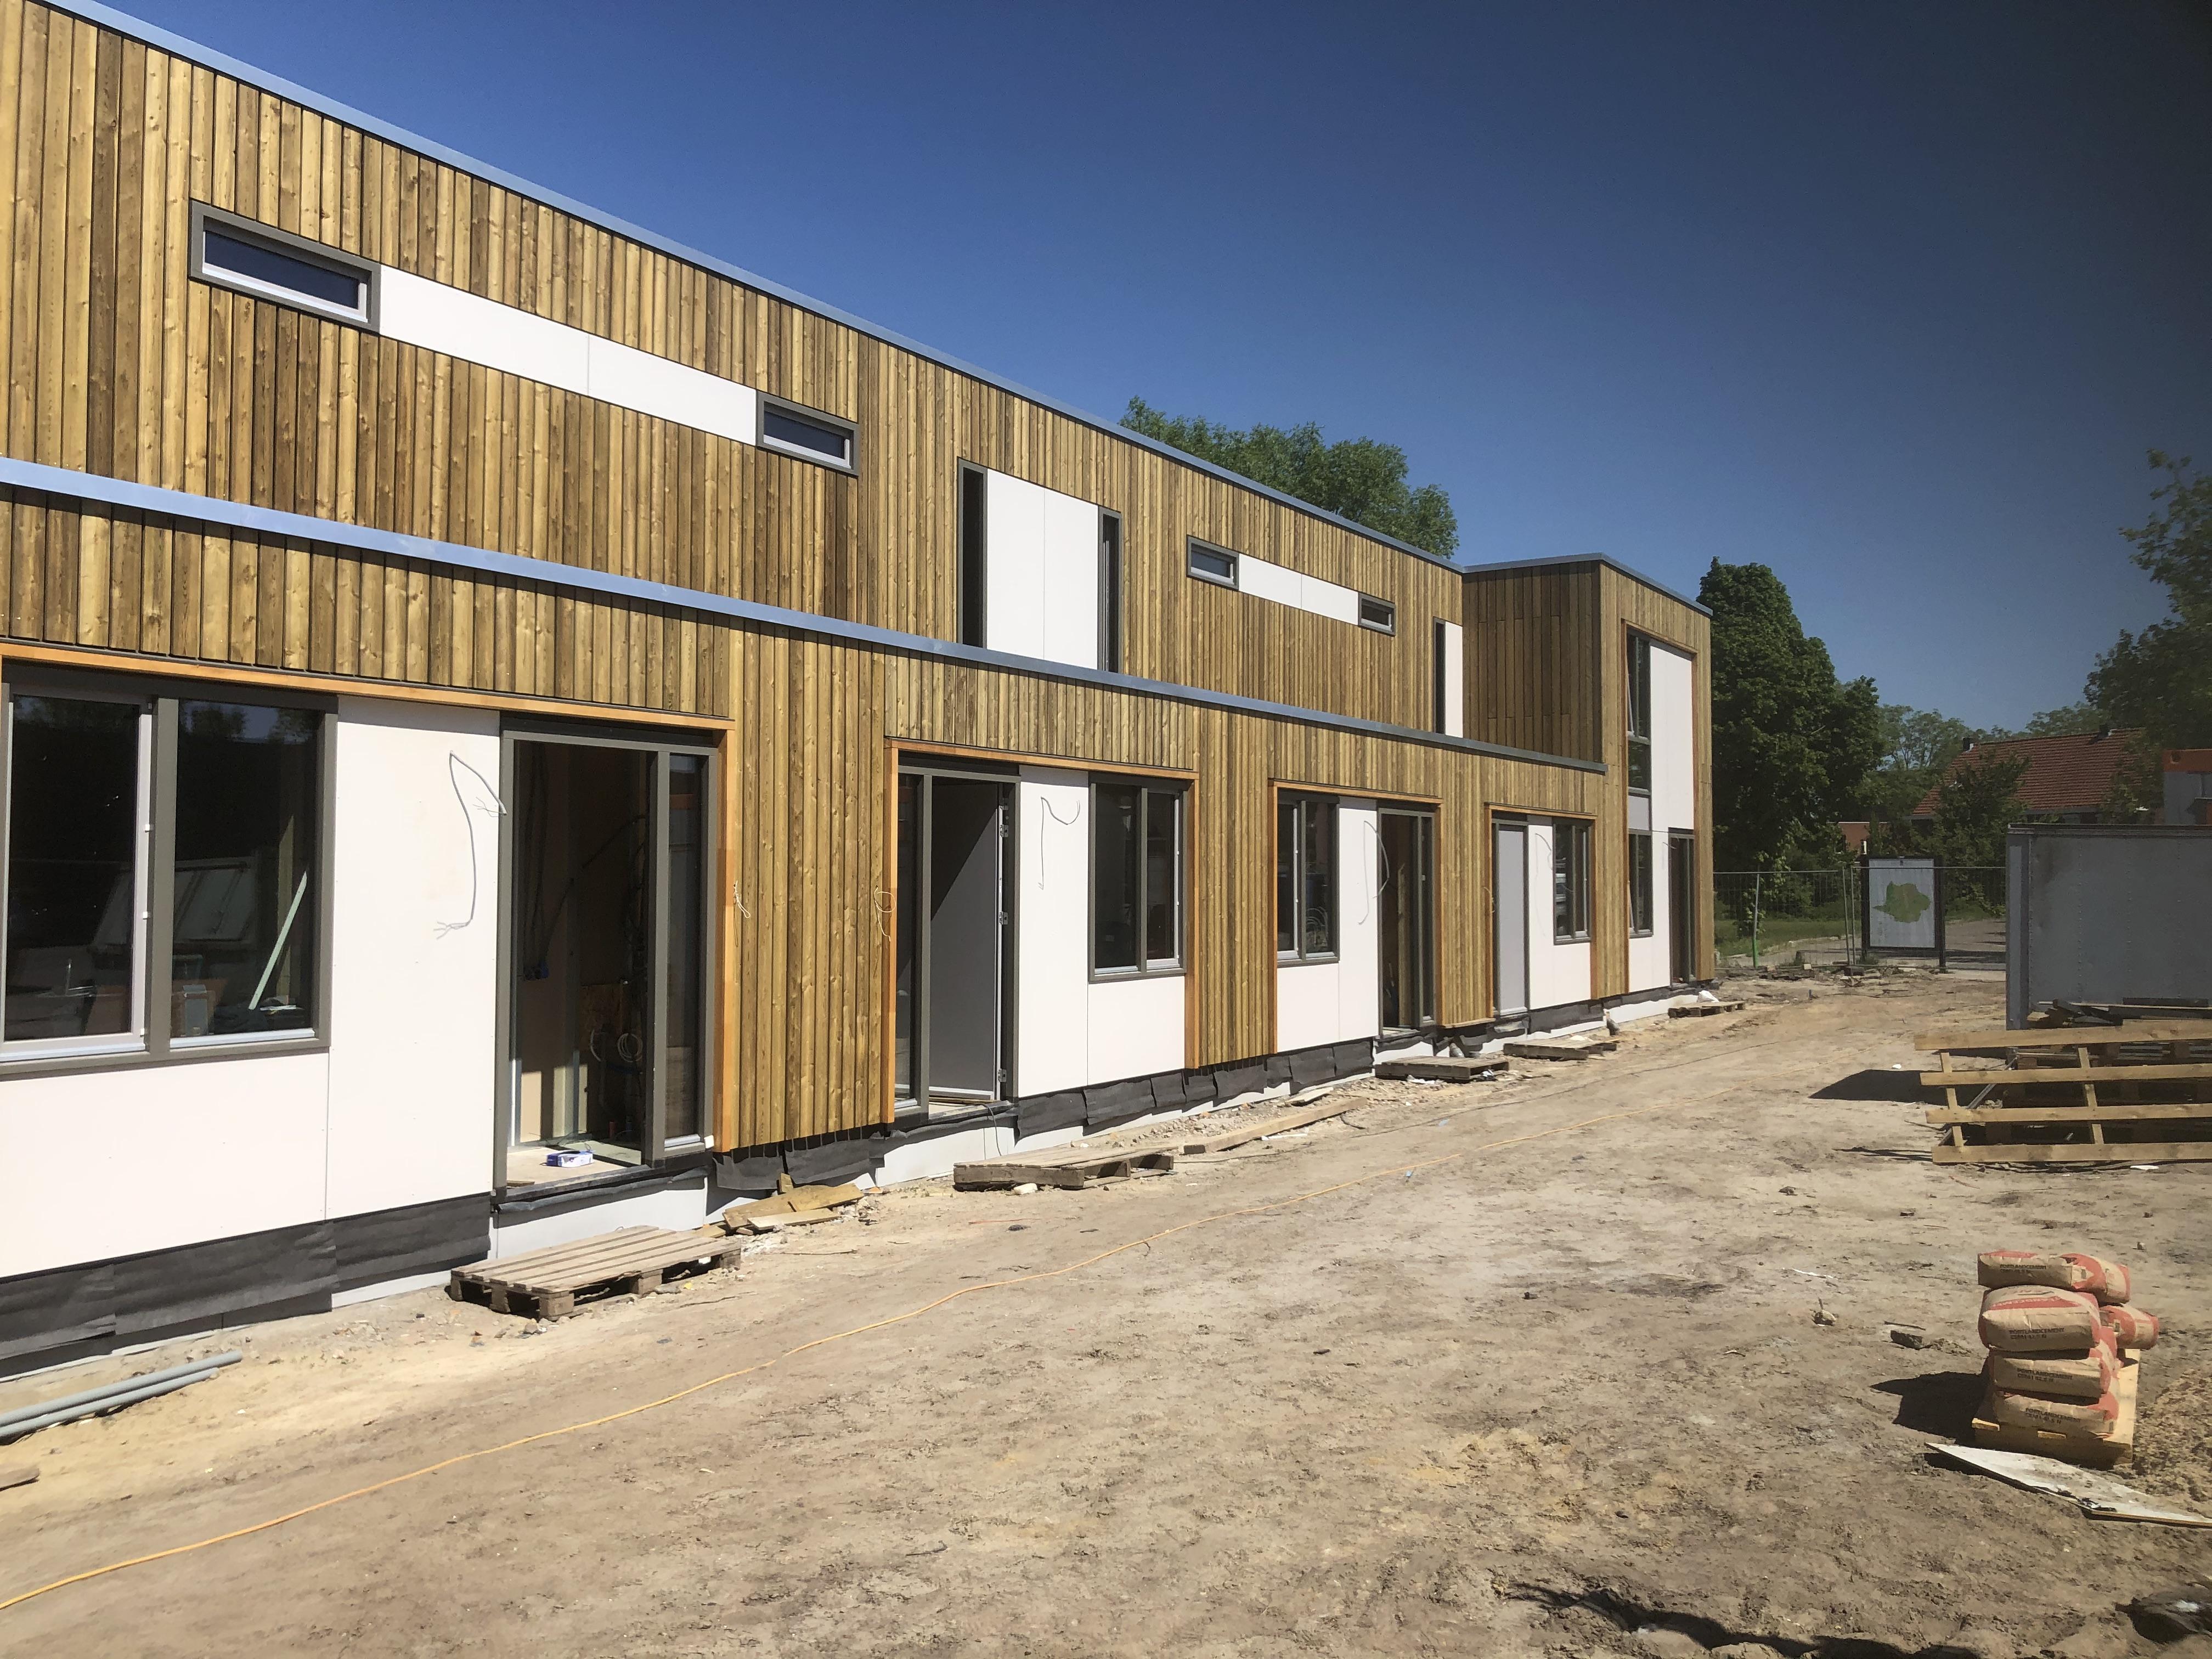 sociale-huurwoningen-wonen-limburg weert massief hout DLT CLT levensloopbestendig